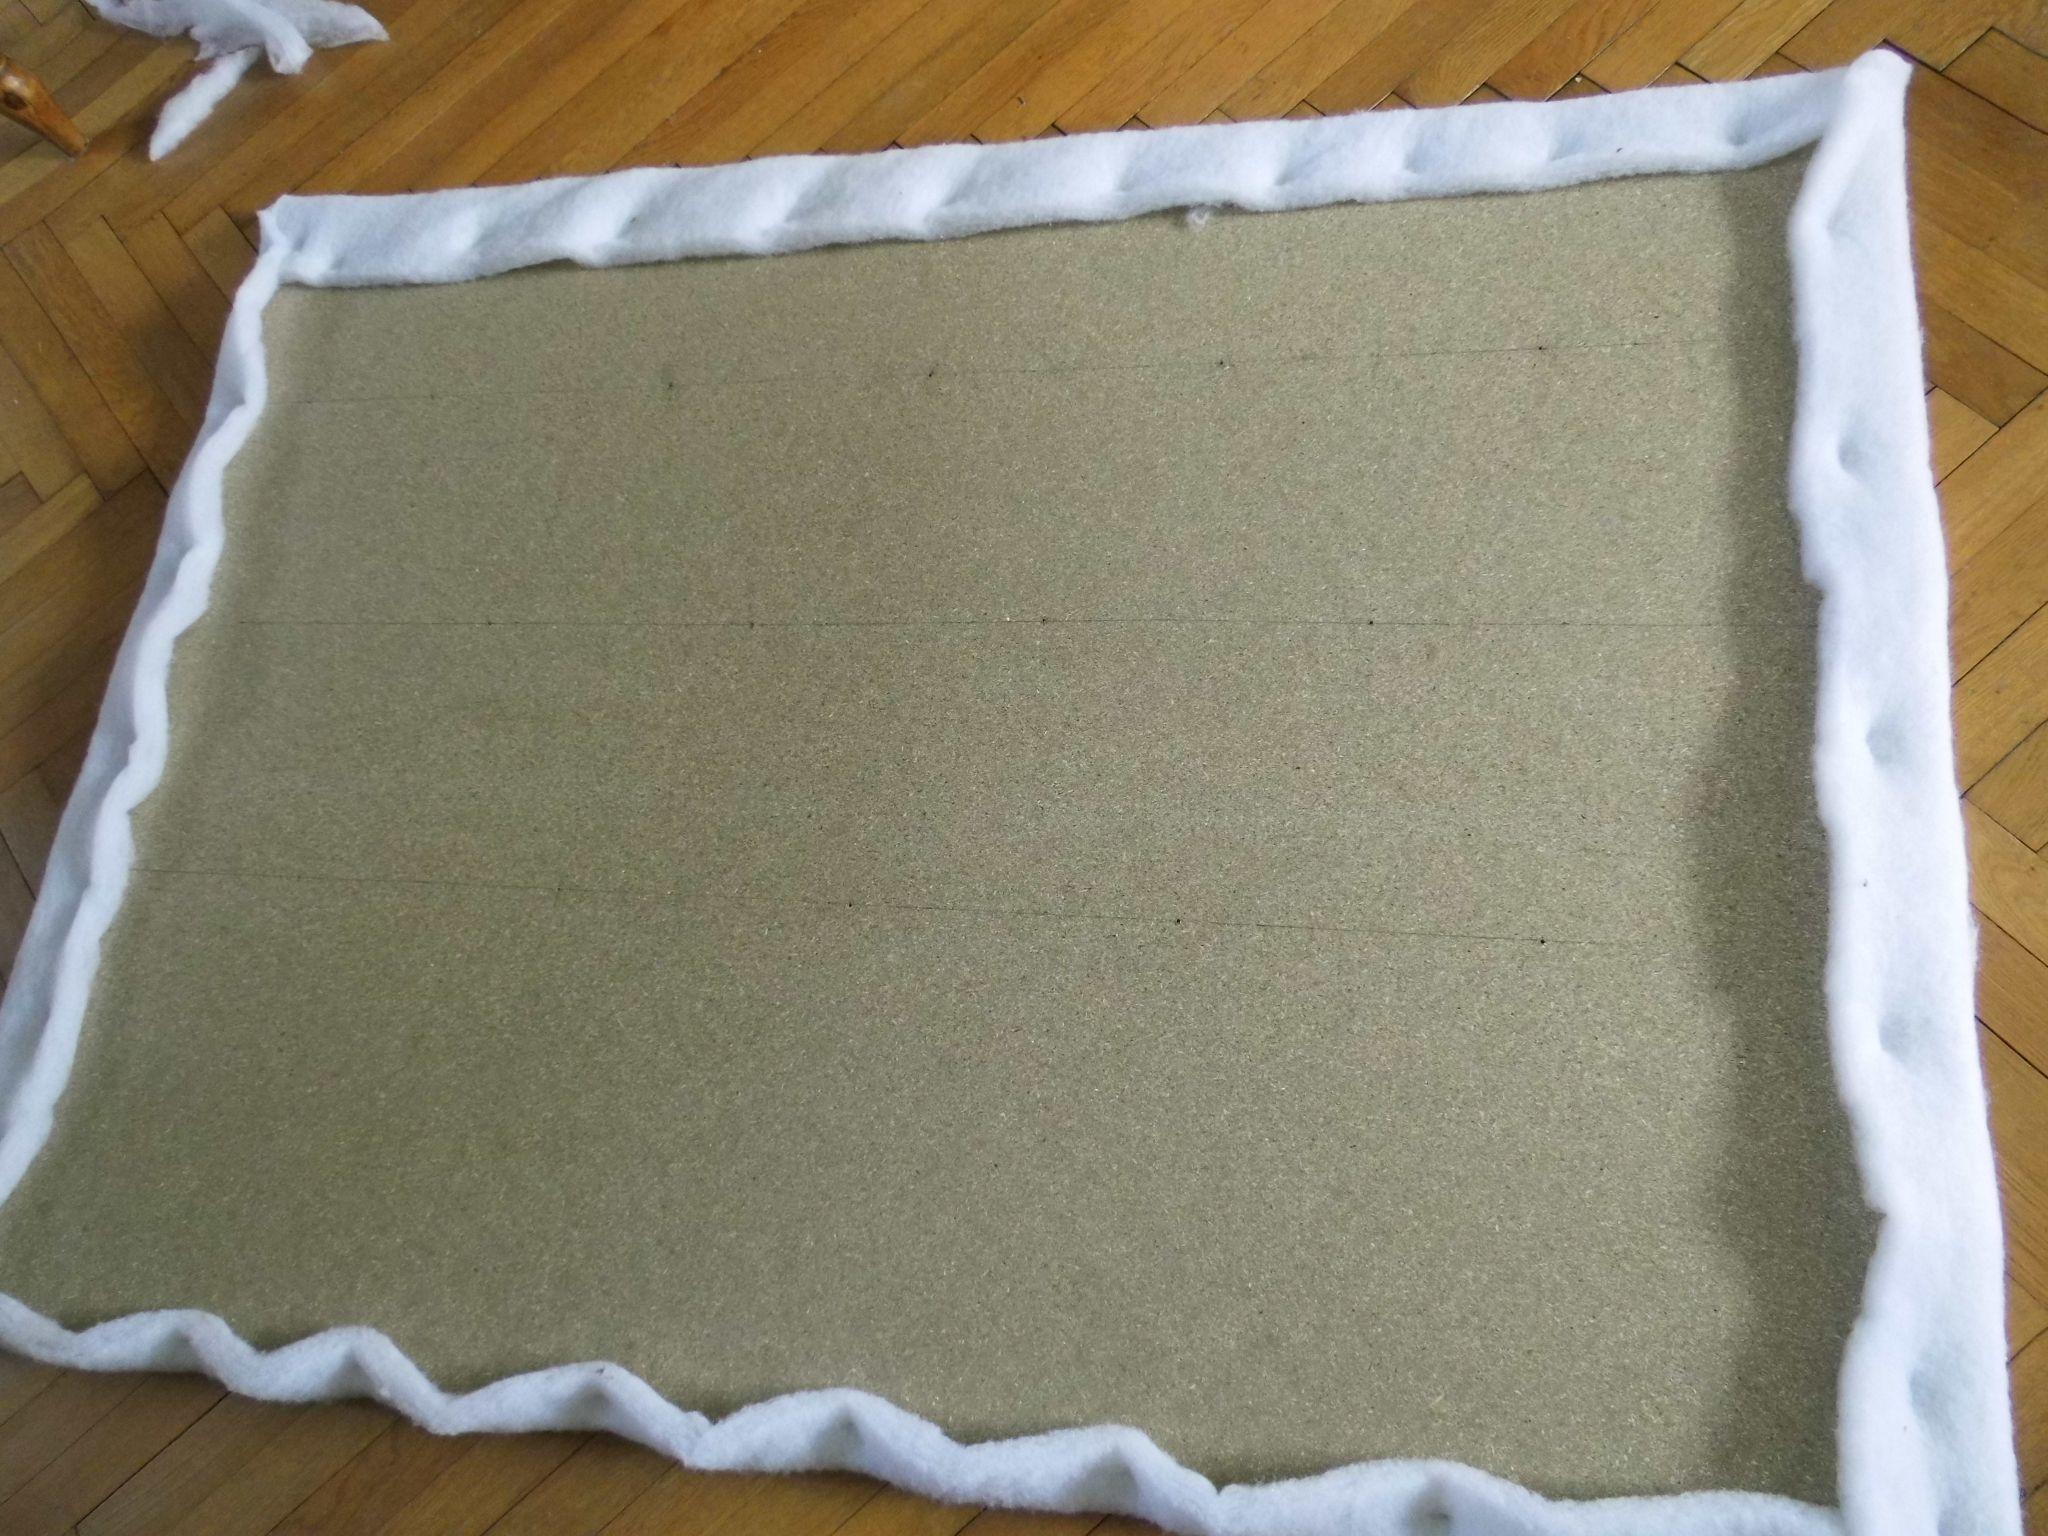 fabriquer tete lit tissu/ mettre couette fine pr molleton | chambre